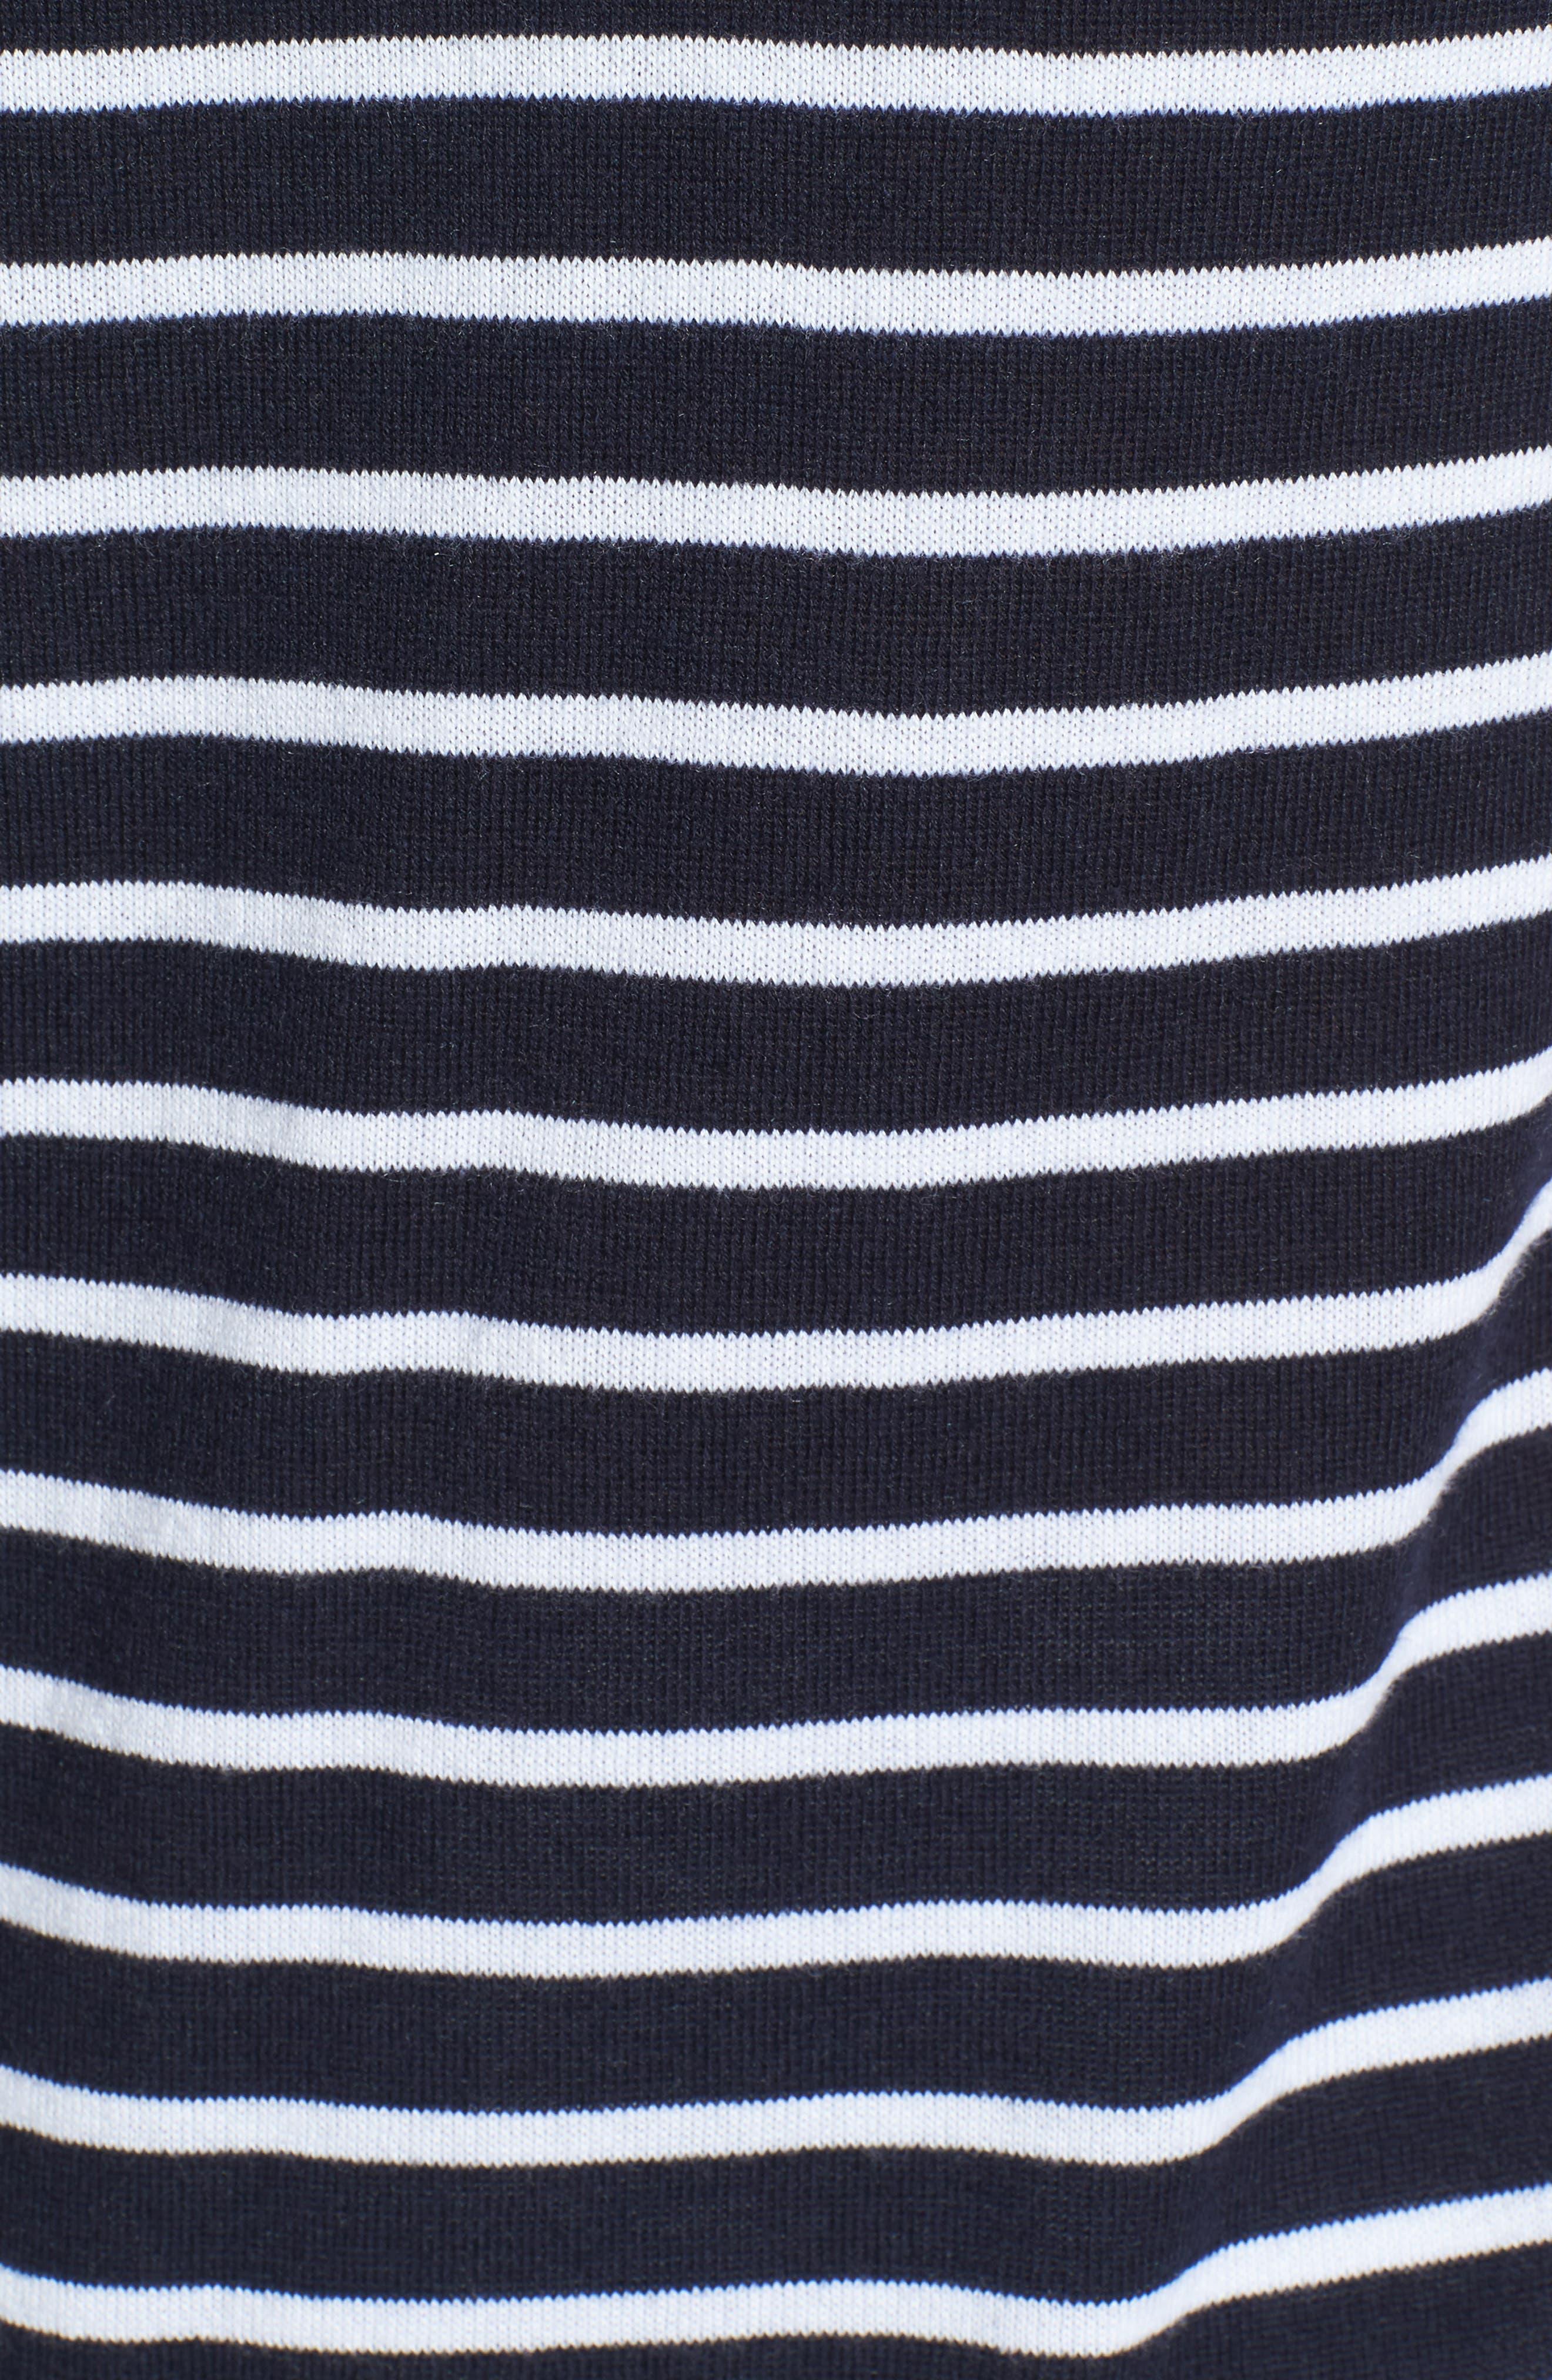 Crewneck Sweater,                             Alternate thumbnail 44, color,